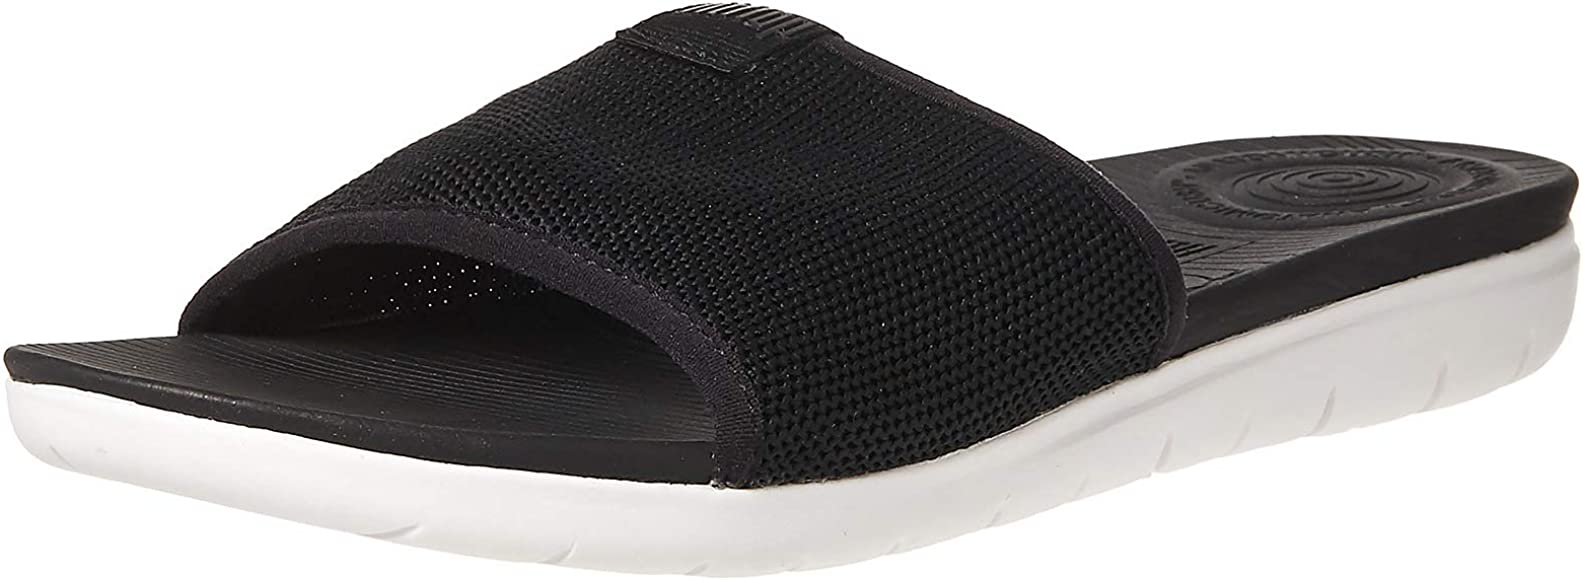 FitFlop Uberknit Slide Sandals